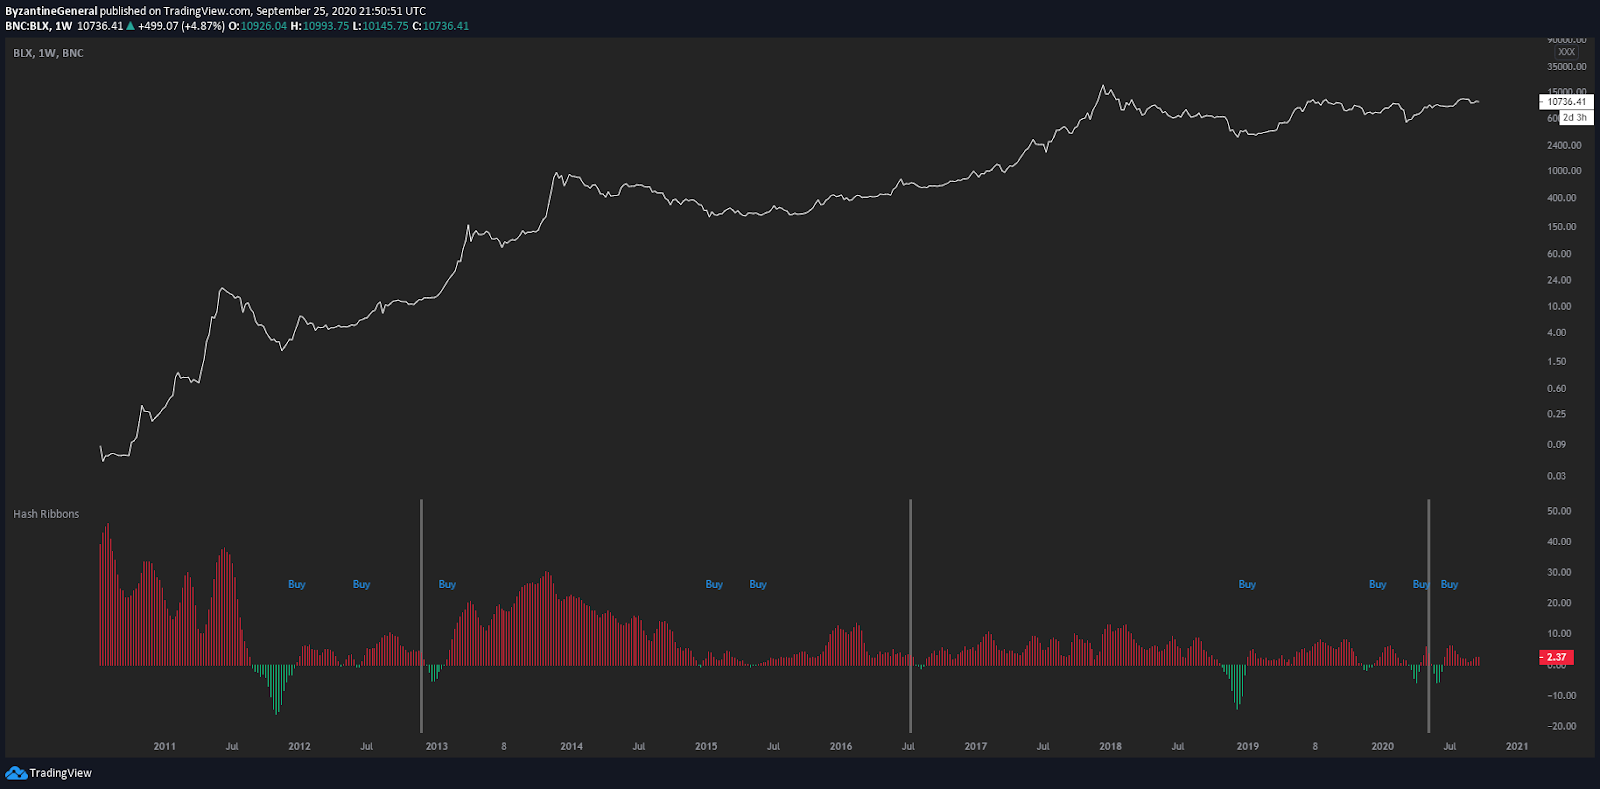 Hash ribbon indicator on top of BTC price chart